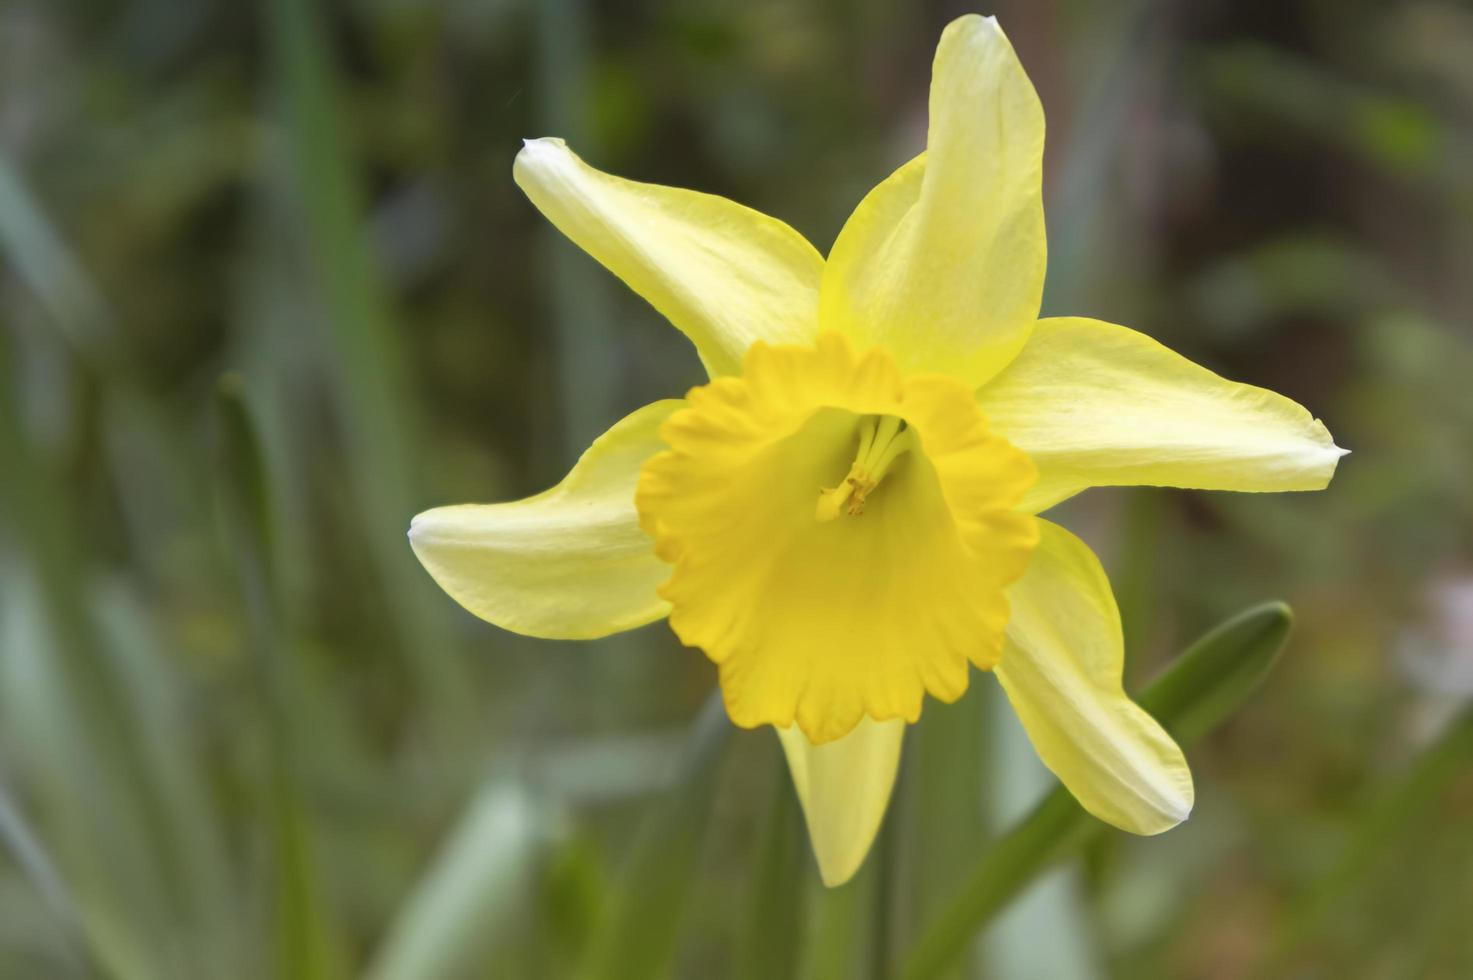 fondo natural con flor de narciso amarillo foto